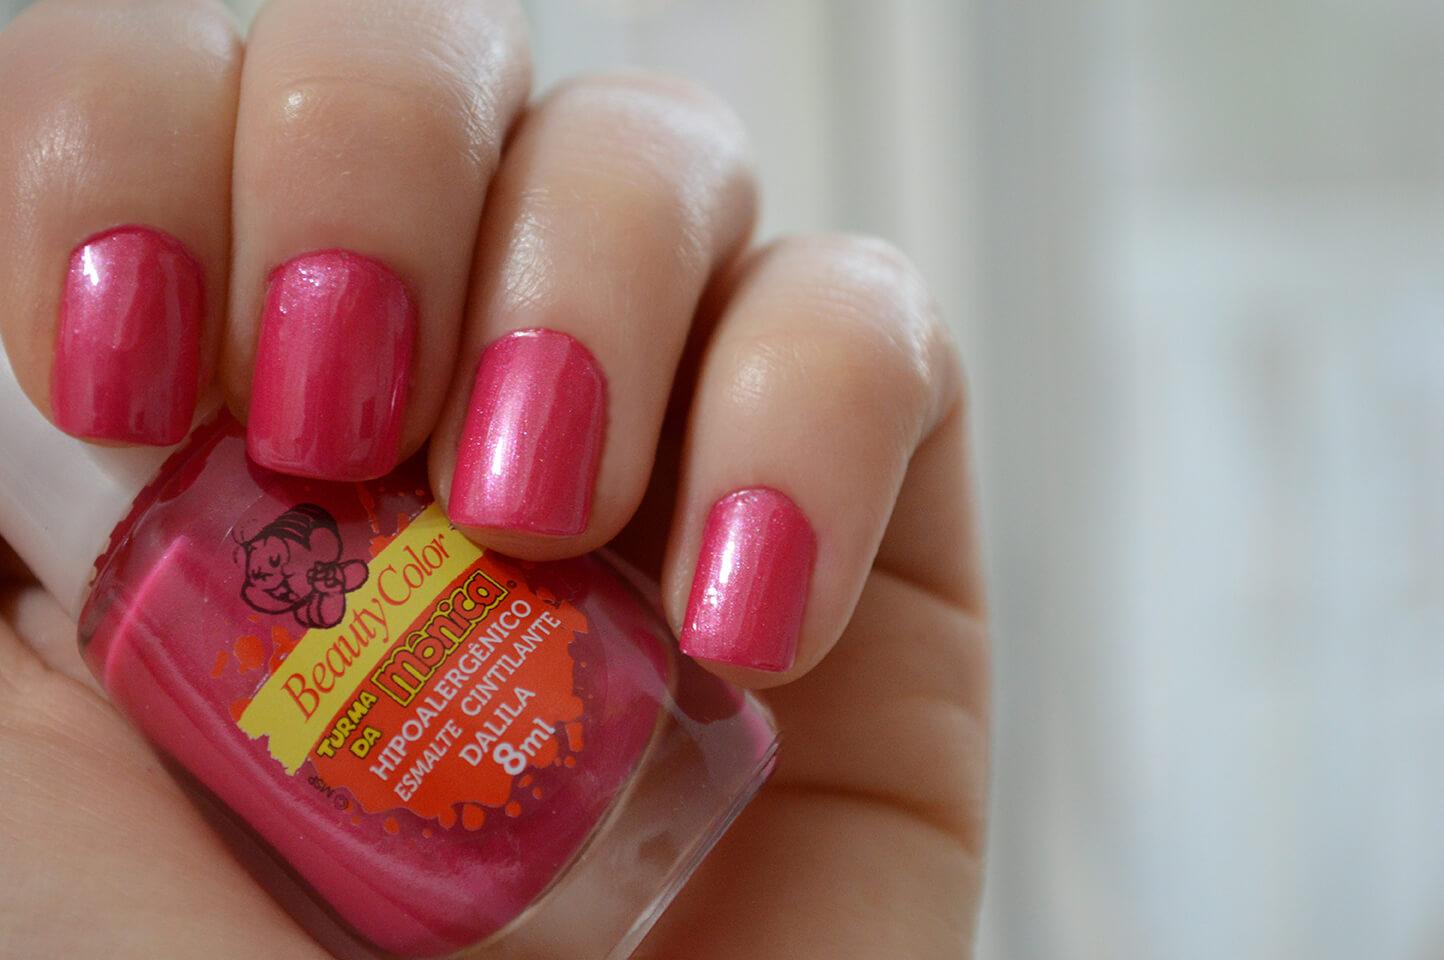 Esmalte Dalila (rosa cintilante) da Beauty Color, Turma da Mônica